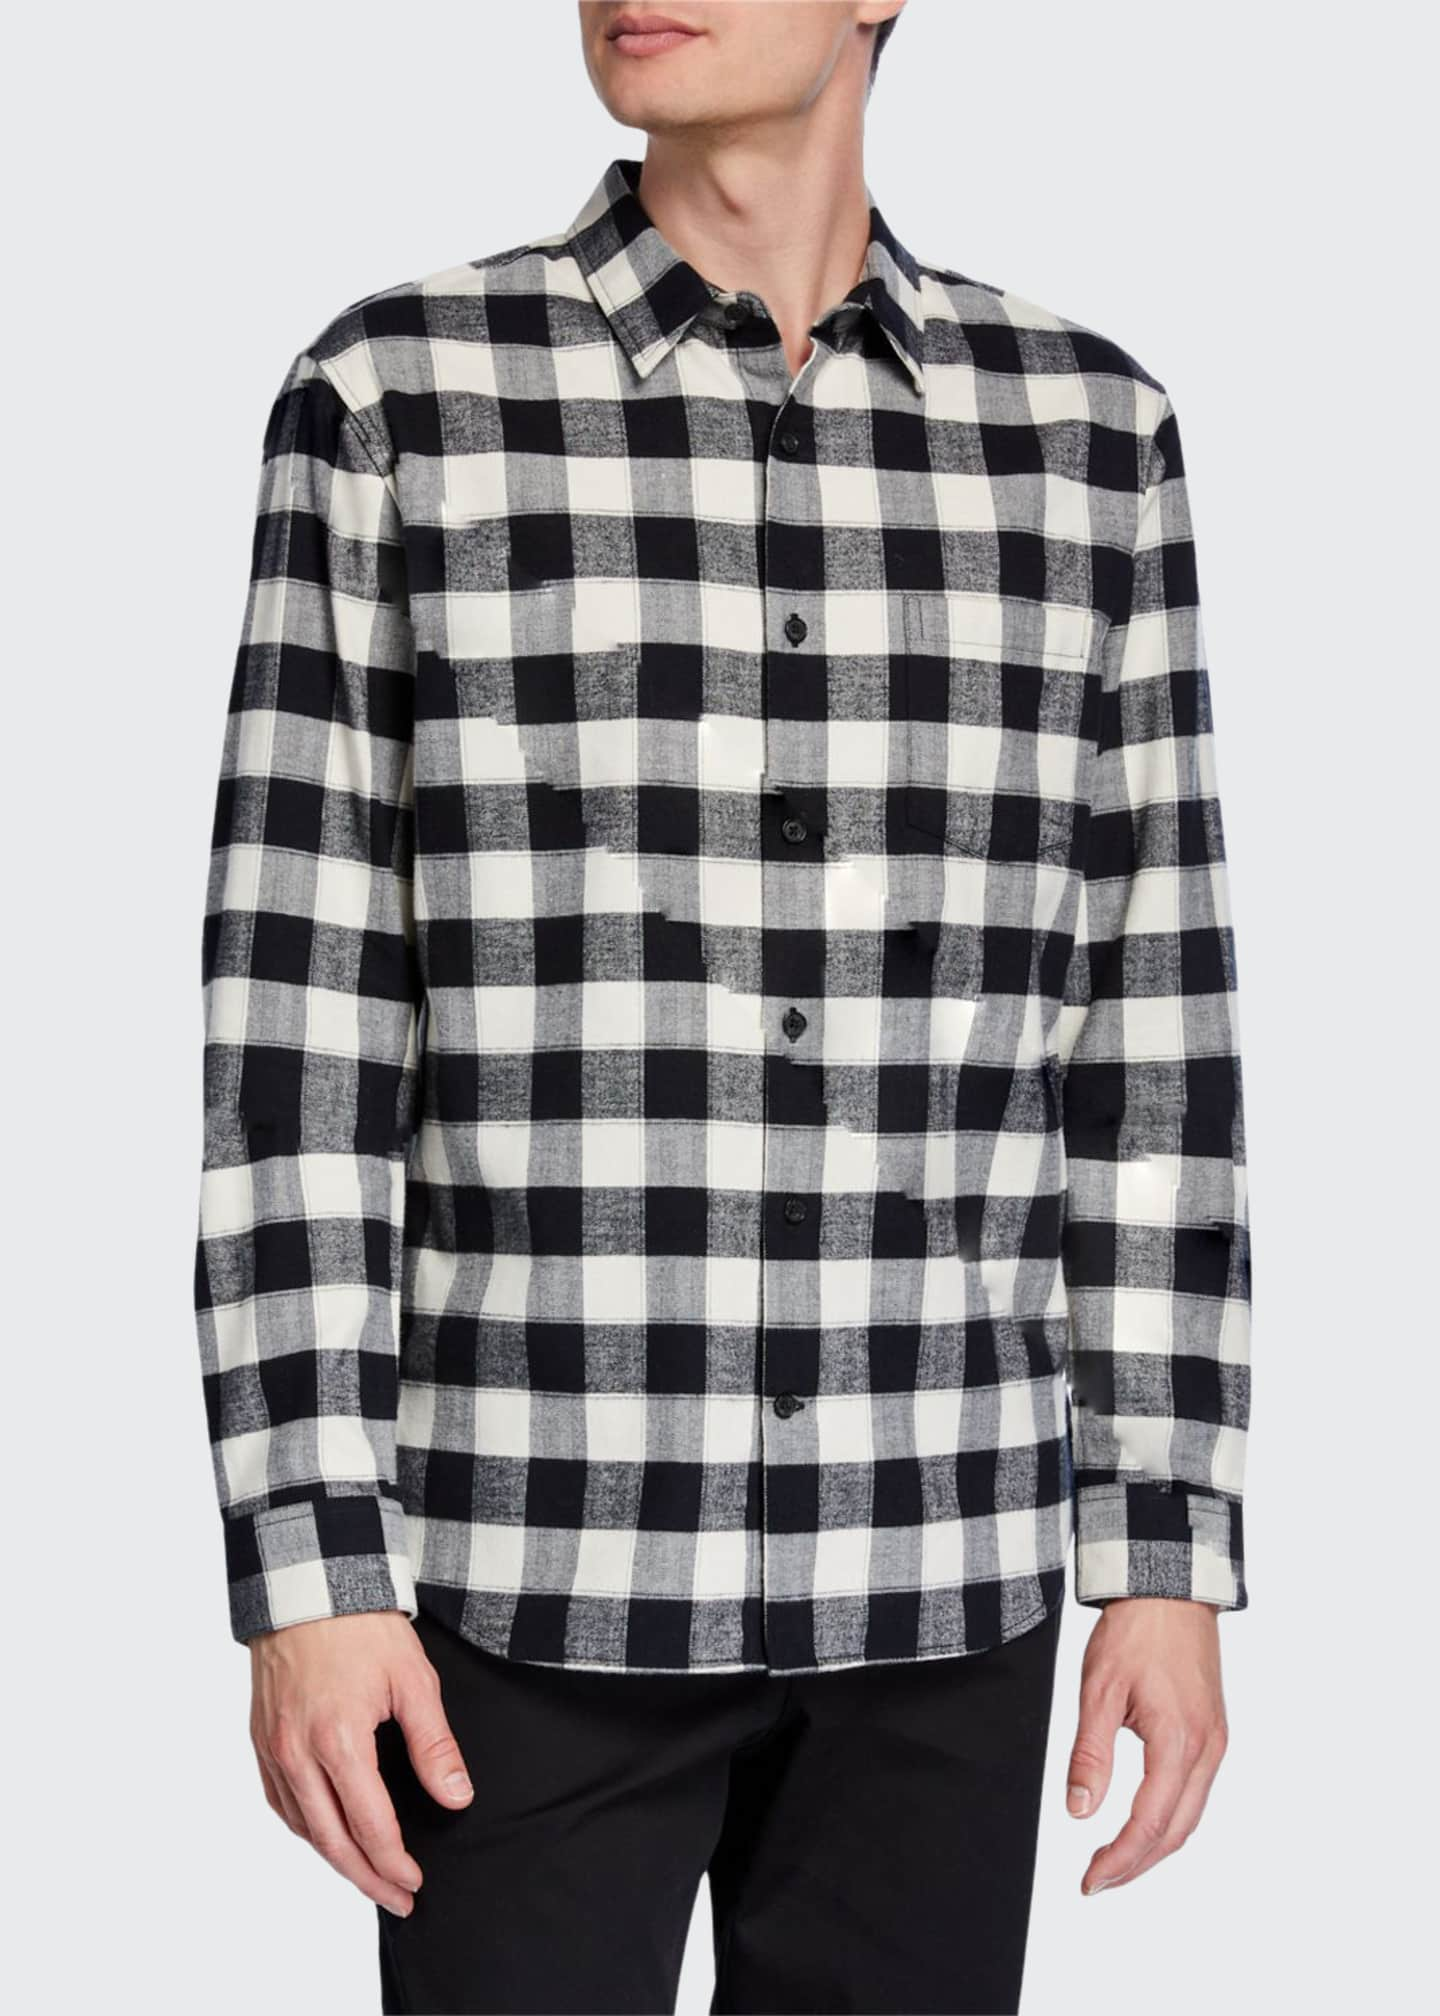 Vince Men's Flannel Buffalo Check Long-Sleeve Sport Shirt